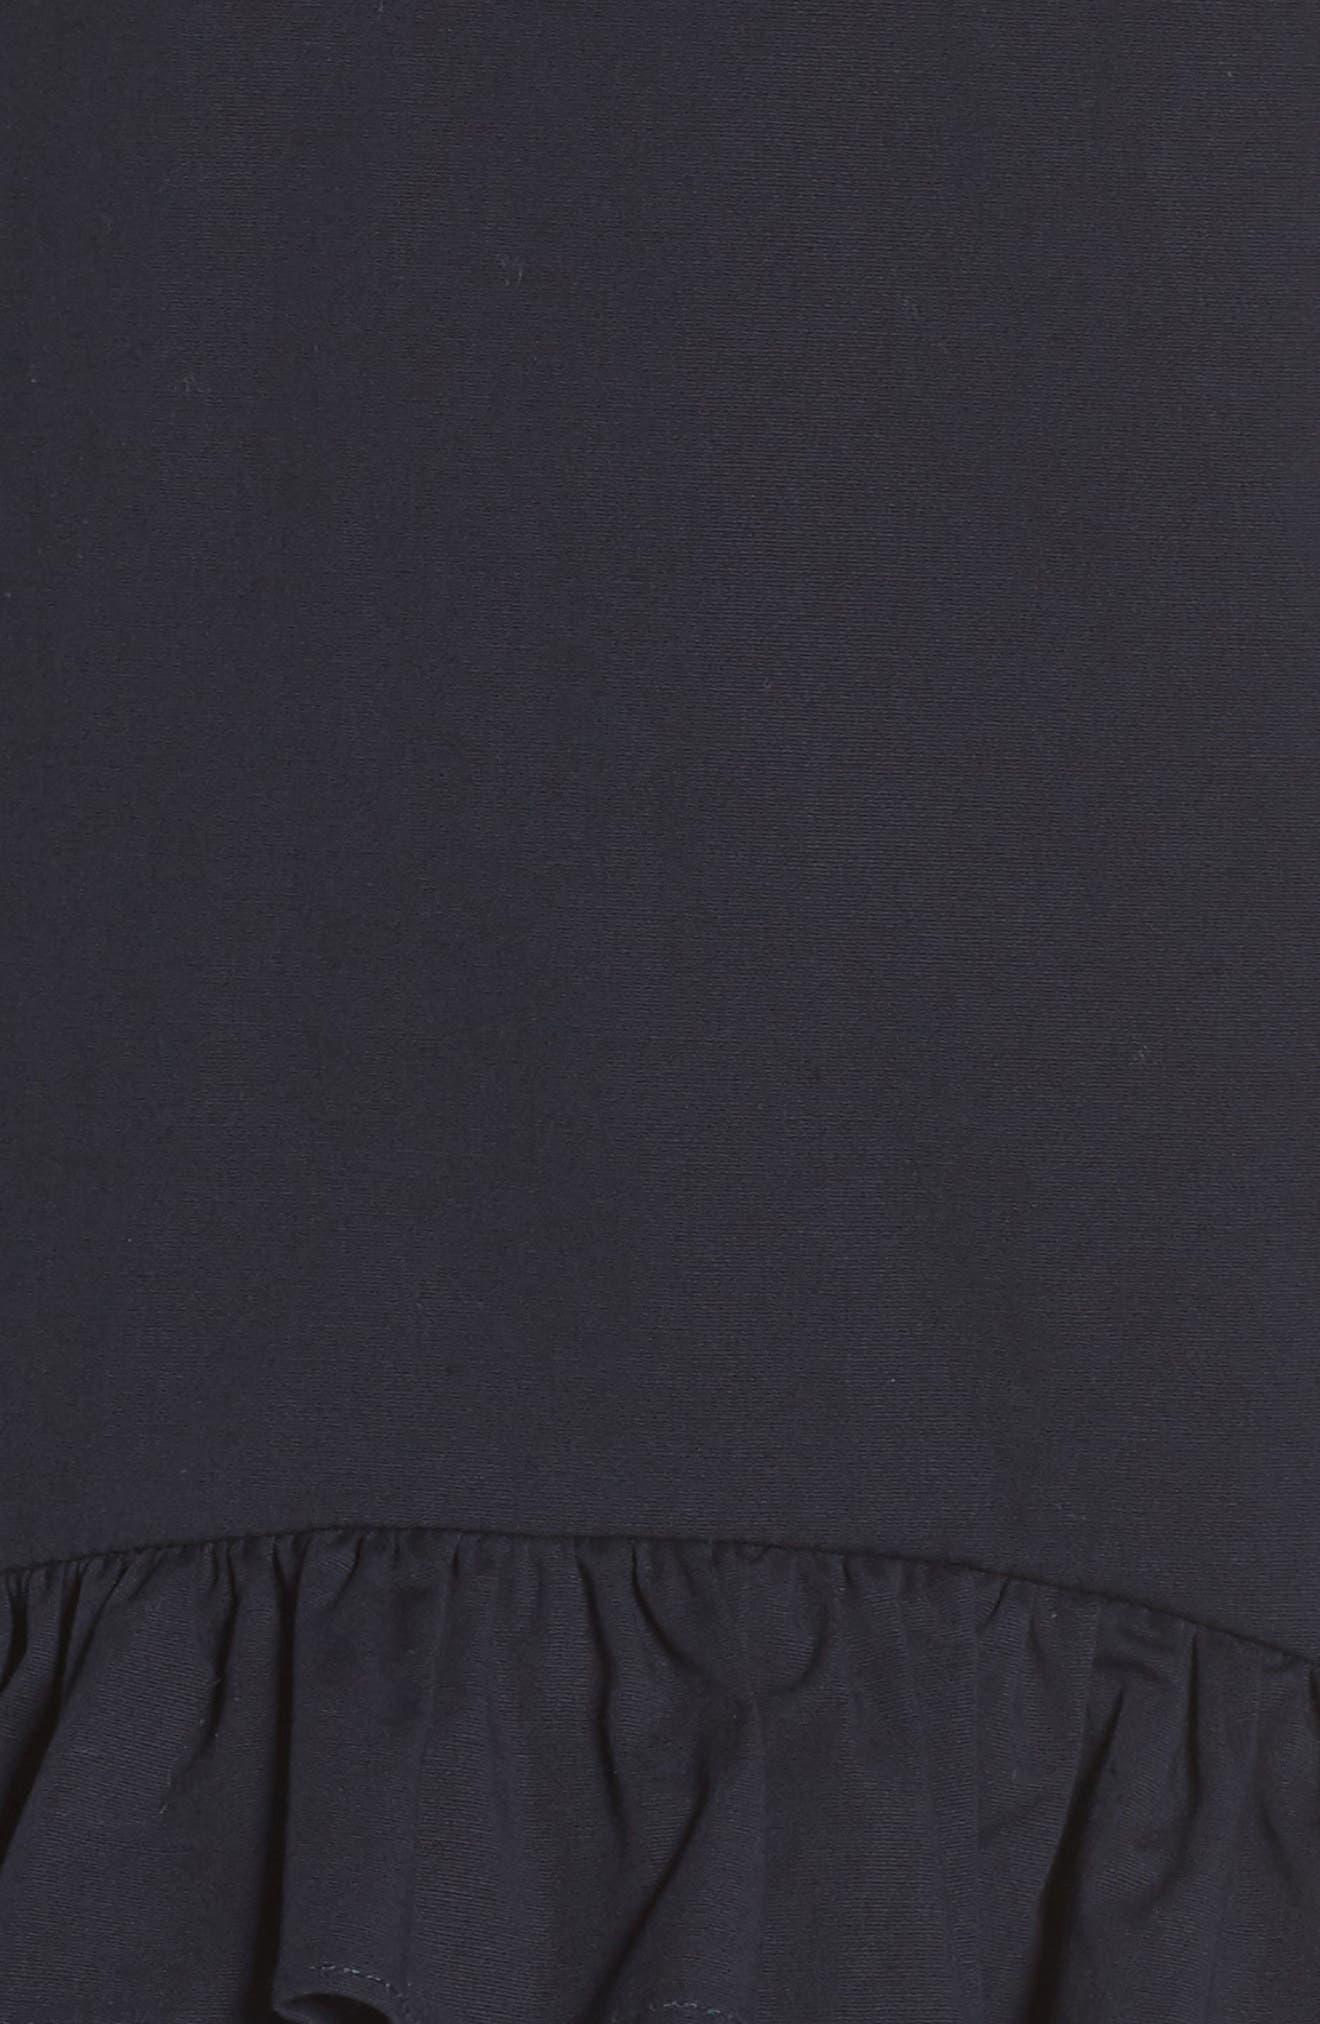 Sleeveless Ruffle High/Low Dress,                             Alternate thumbnail 6, color,                             402